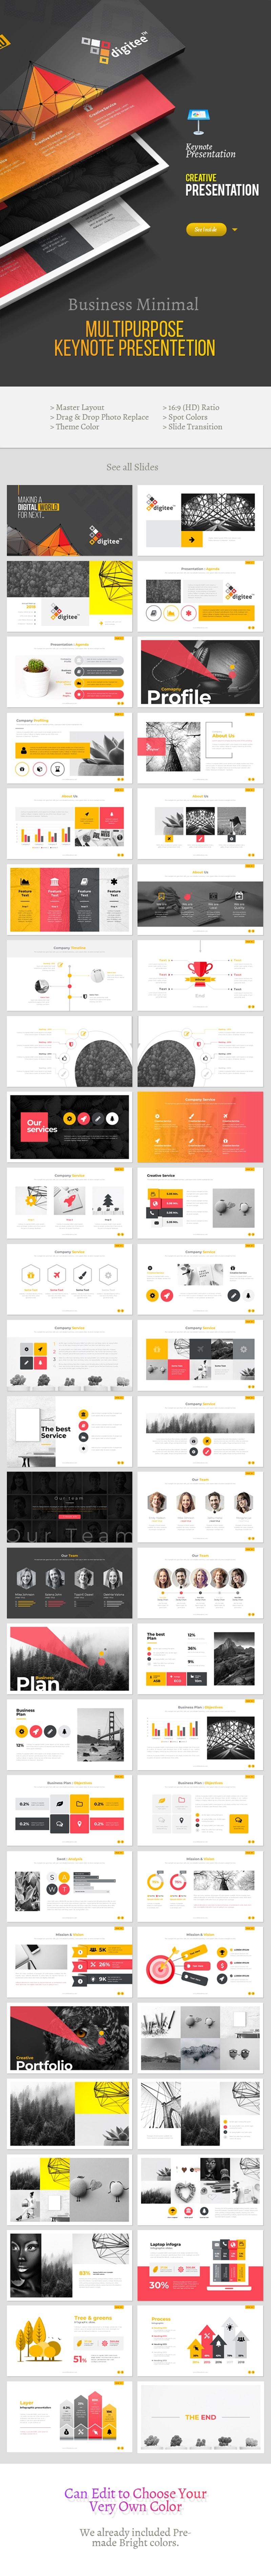 Digitee Multipurpose Keynote Presentation Template